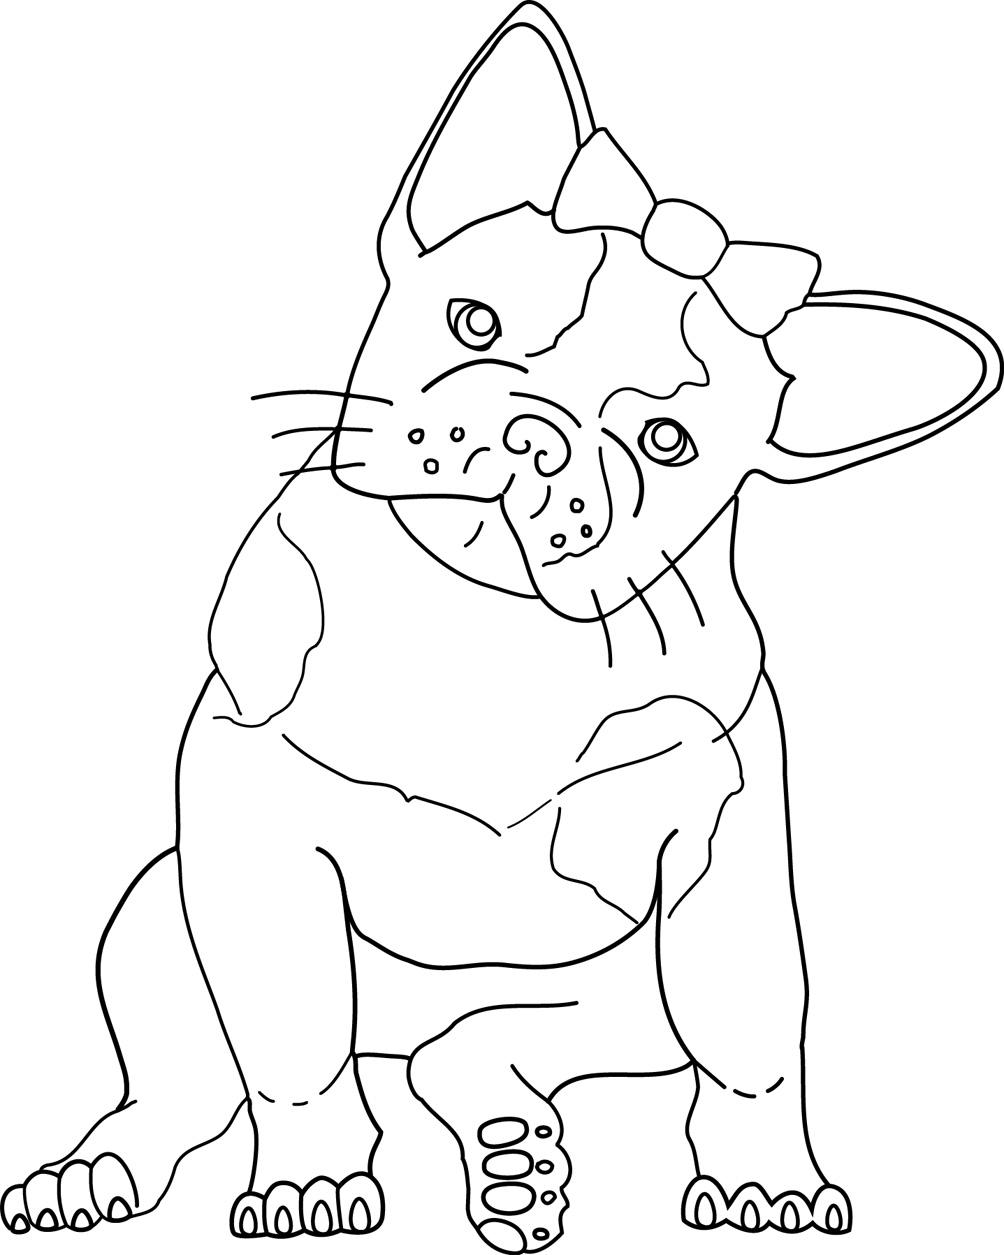 bulldog coloring pages to print - photo#12